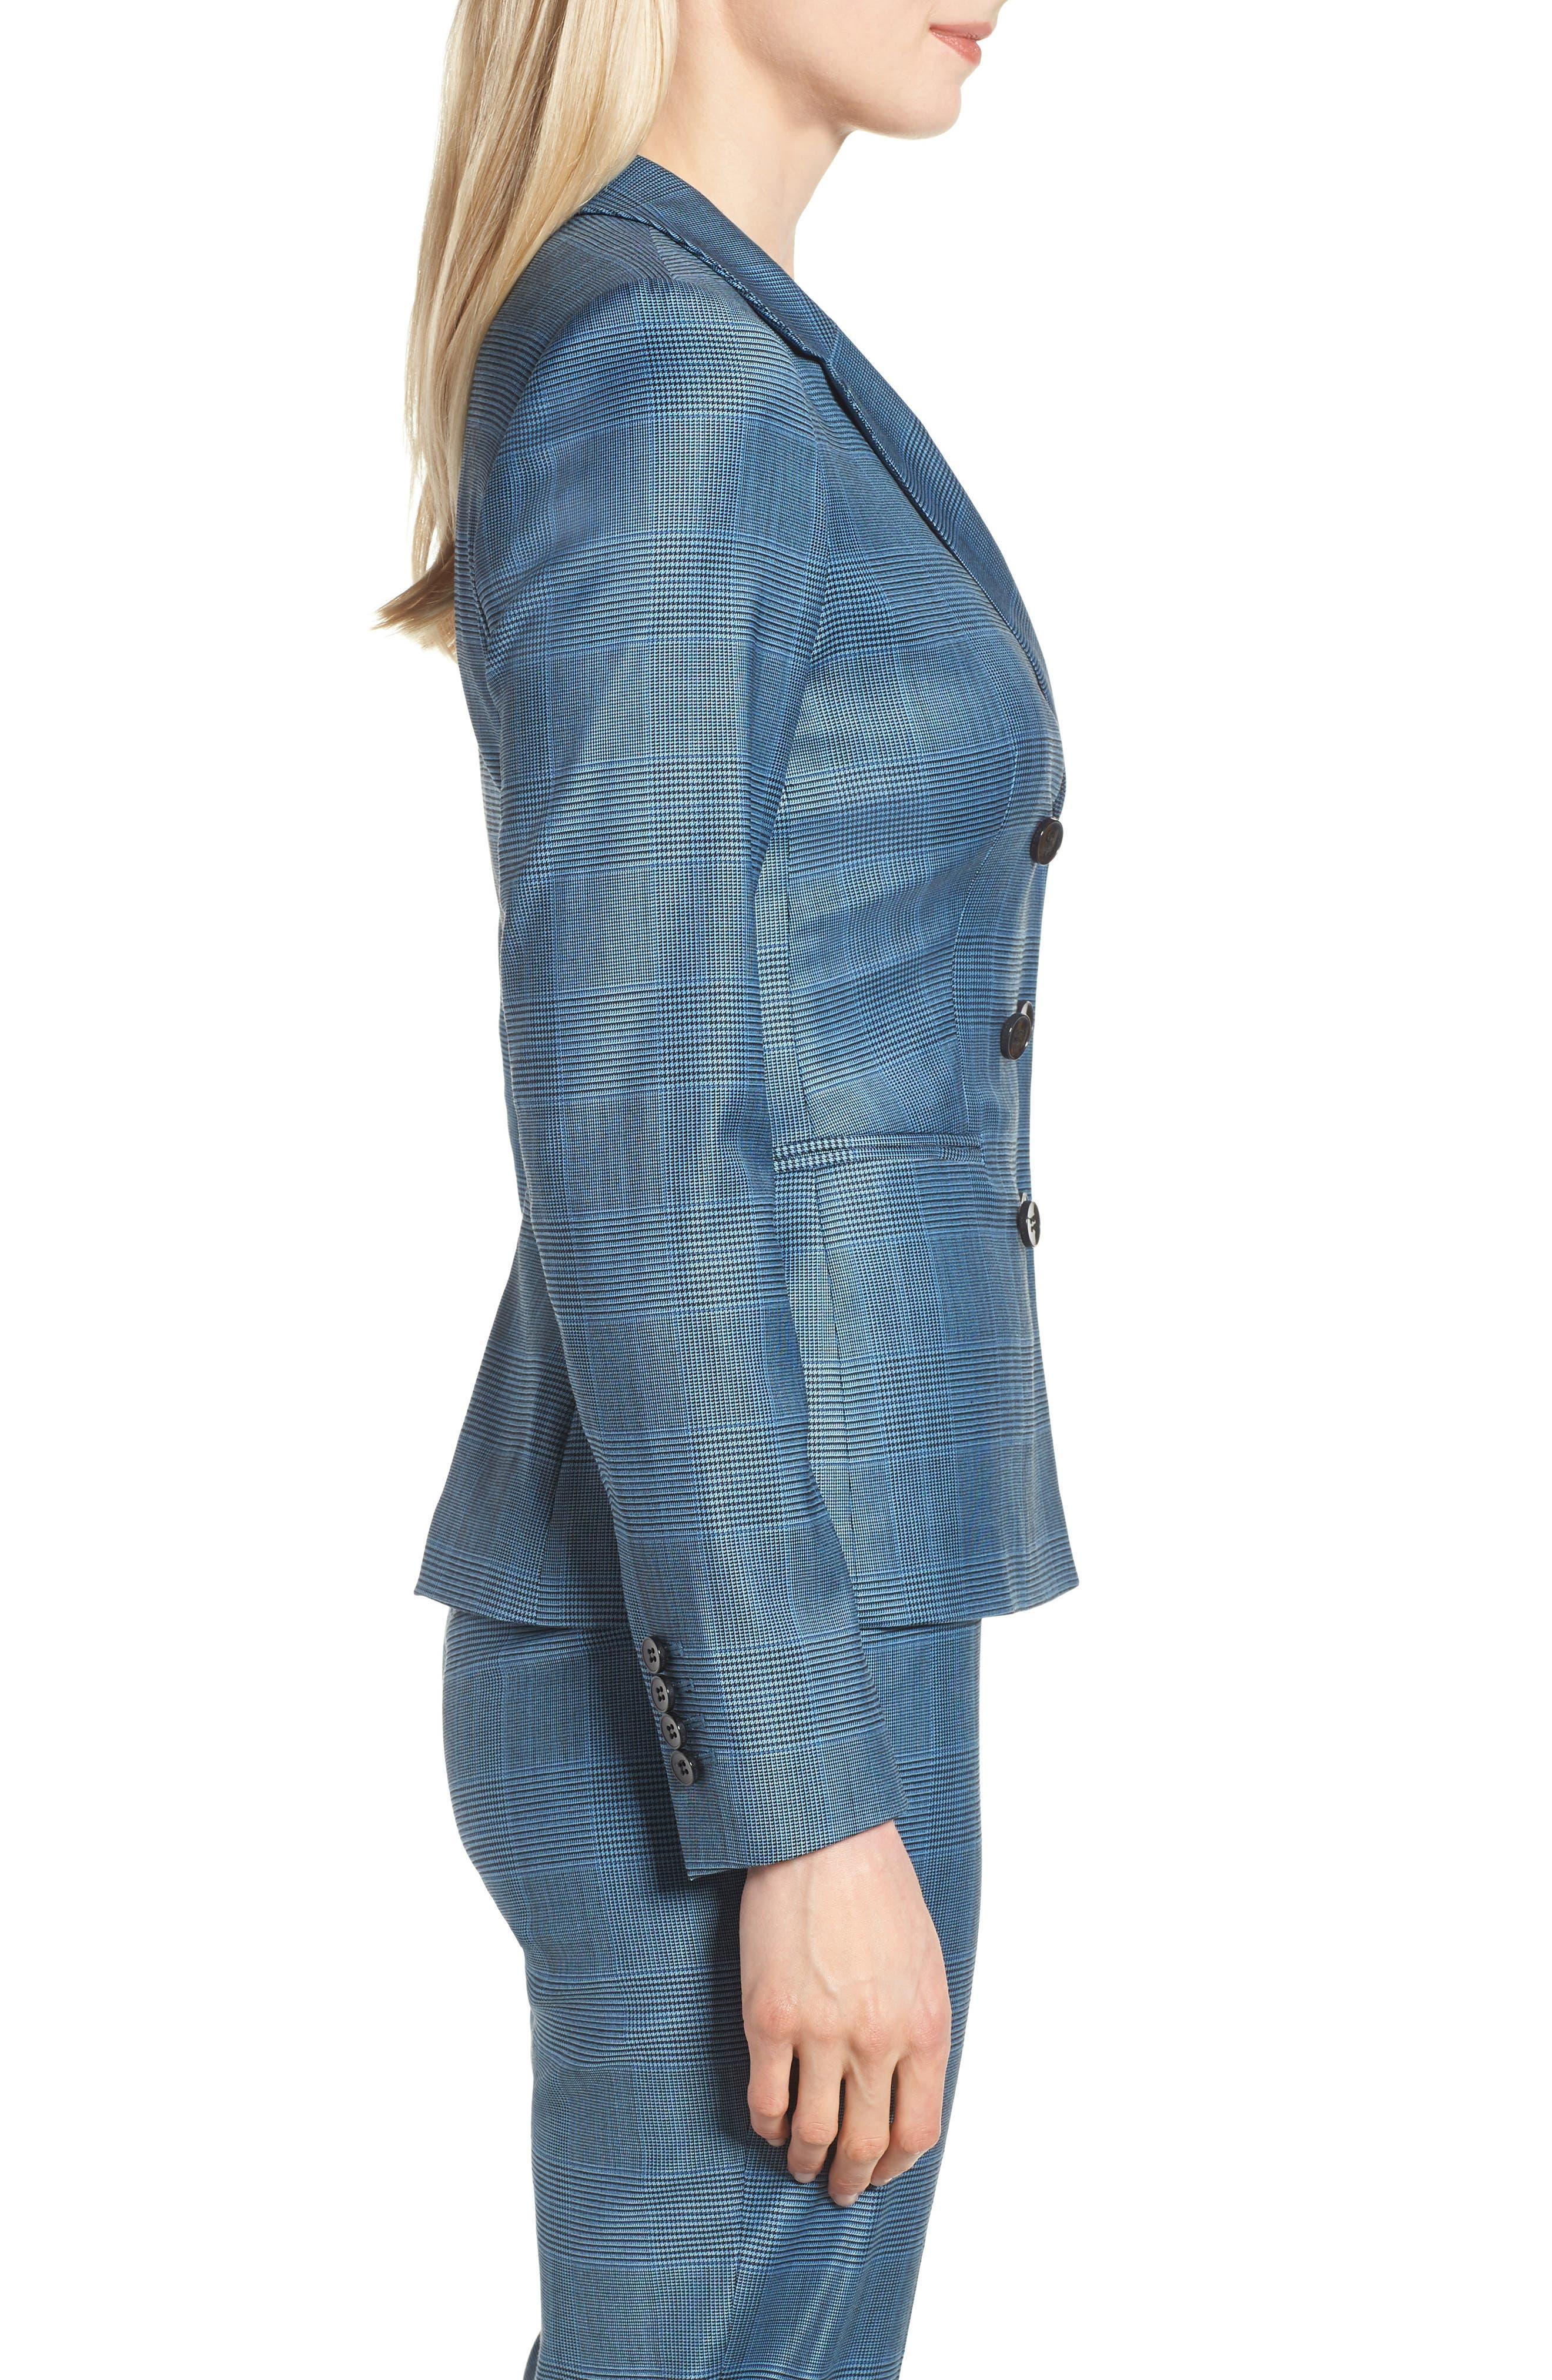 Jelaya Glencheck Double Breasted Suit Jacket,                             Alternate thumbnail 3, color,                             Sailor Blue Fantasy